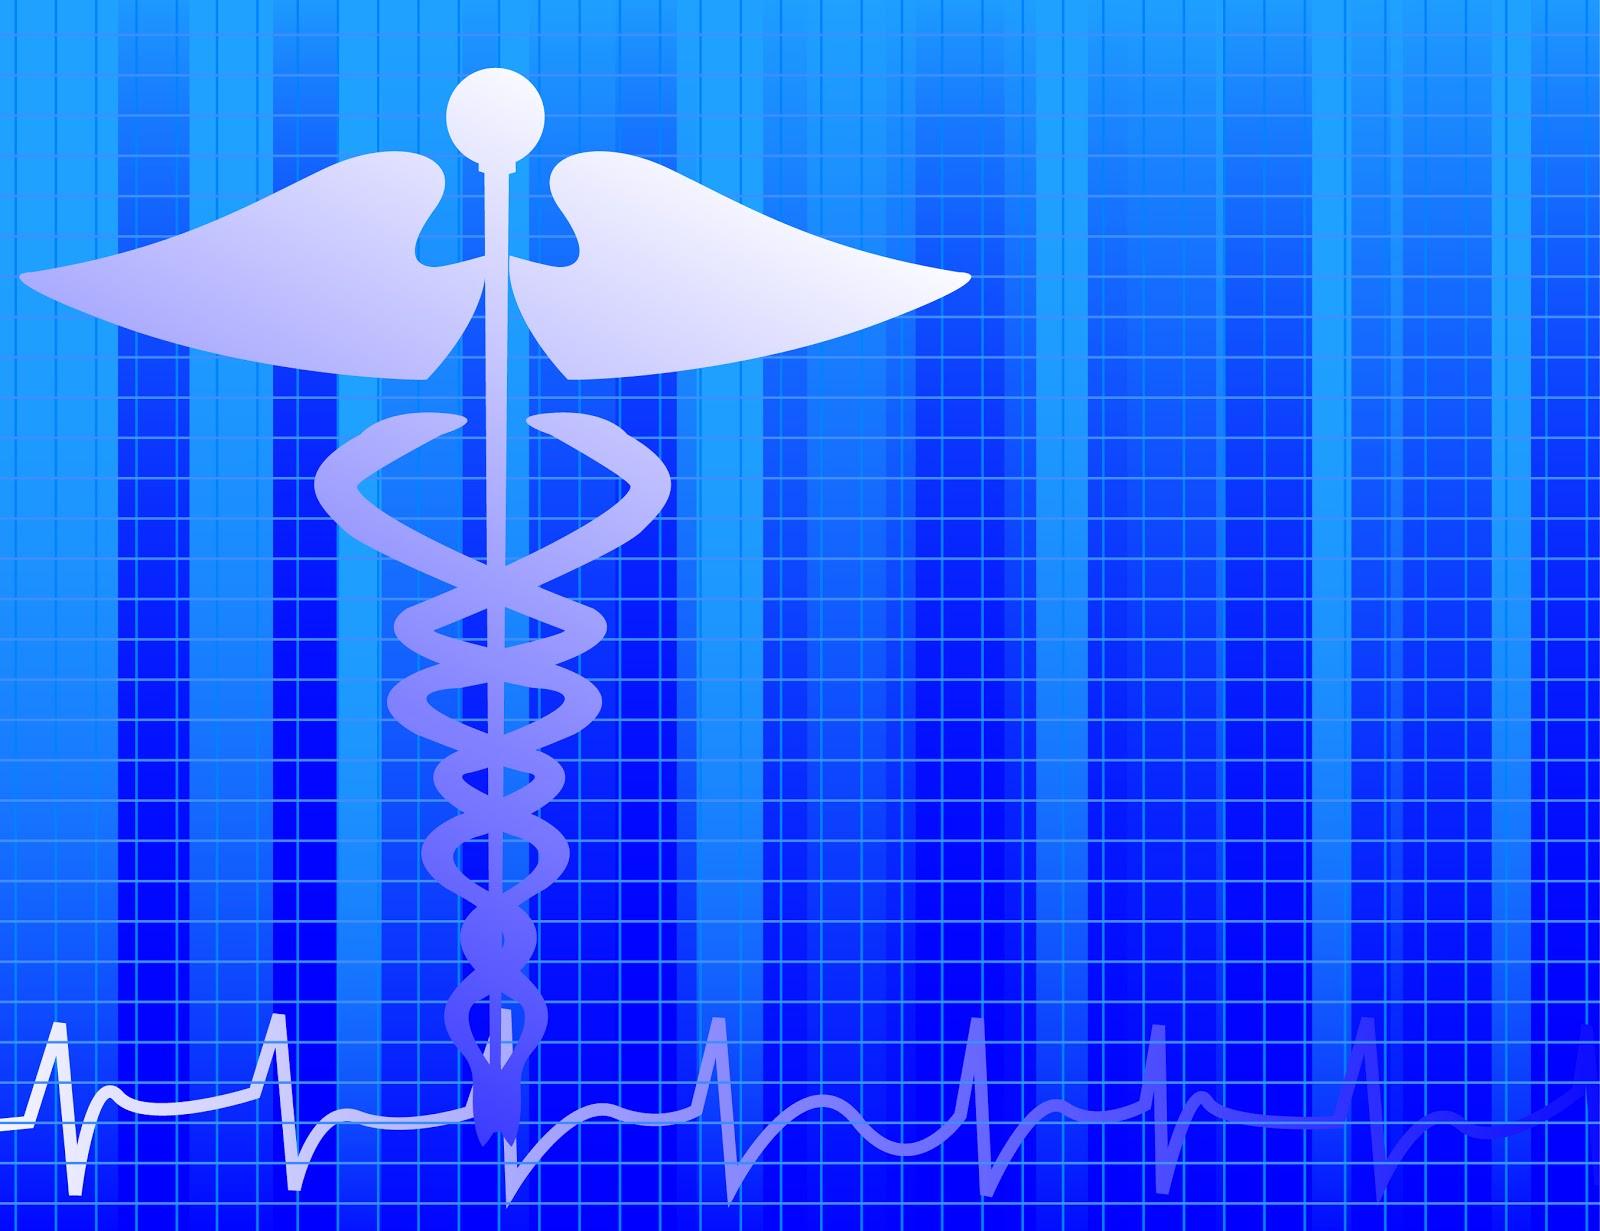 Medical Wallpaper Powerpoint Medical Background Design 2193204 Hd Wallpaper Backgrounds Download